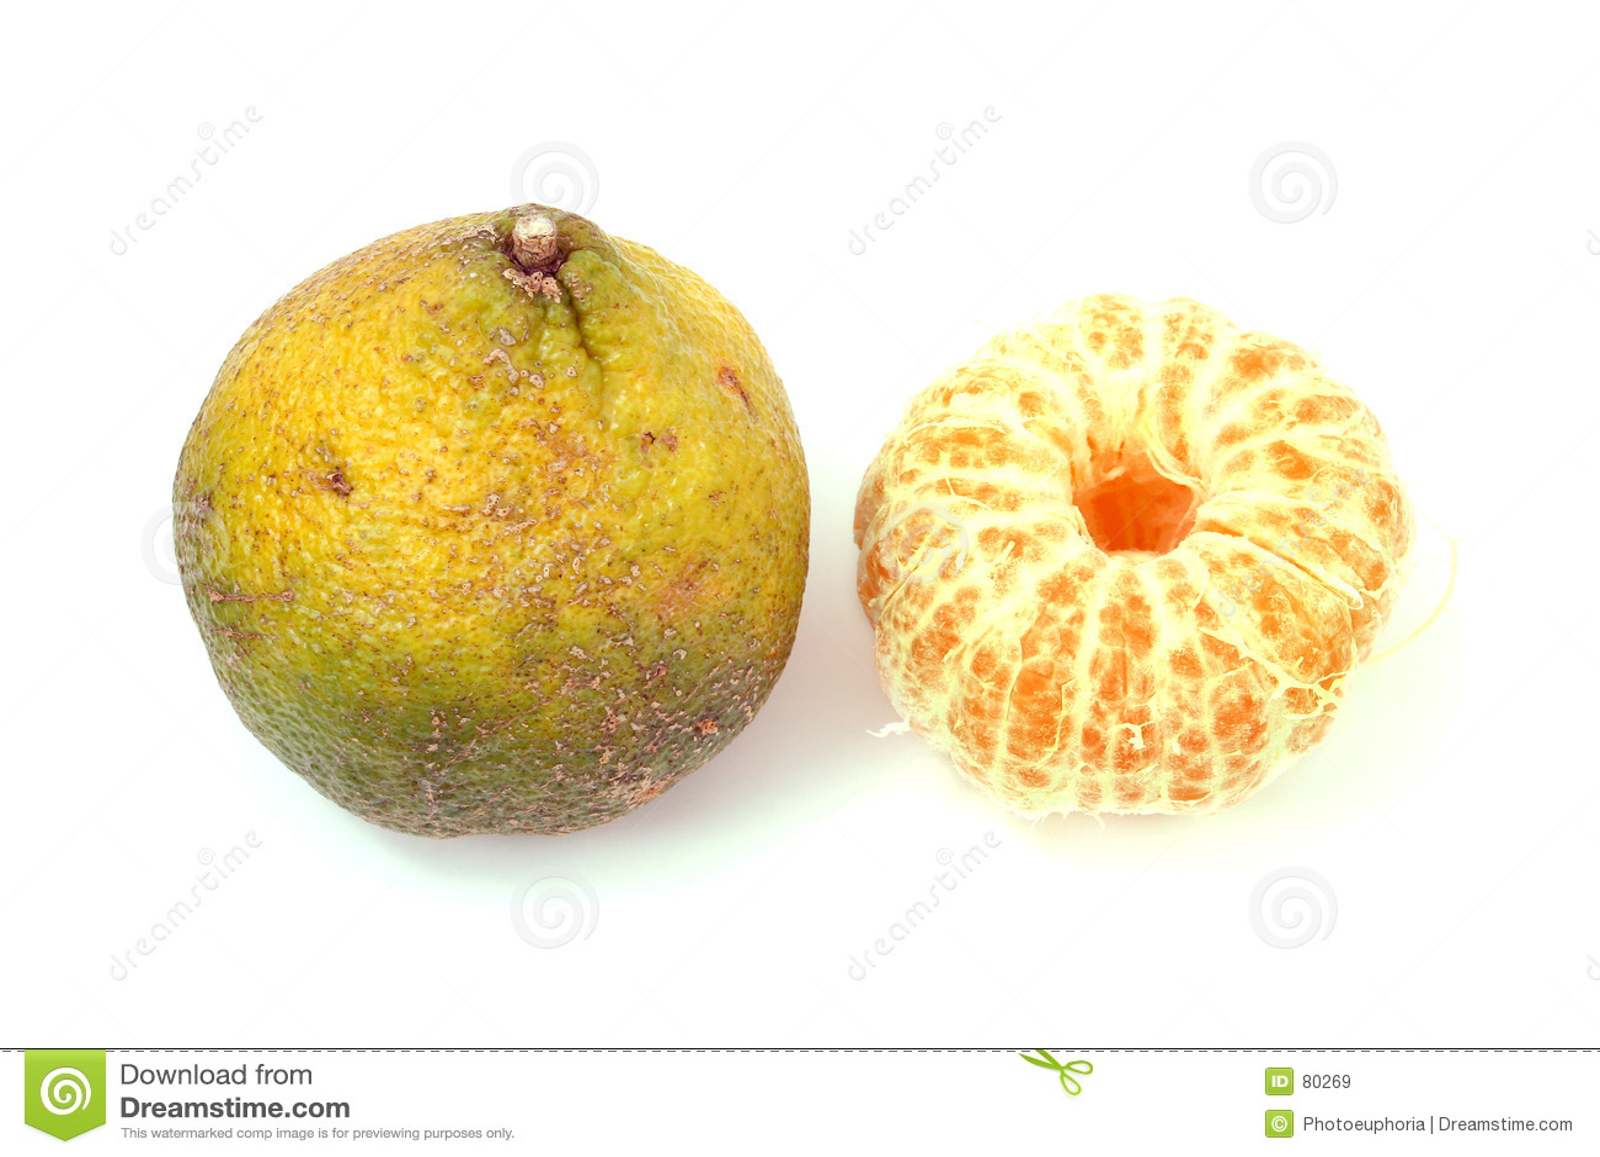 A Cross Between Mandarin Orange And Pomelo The Original Grapefruit Native To Jamaica Combines Best Characteristics Of Tangerine